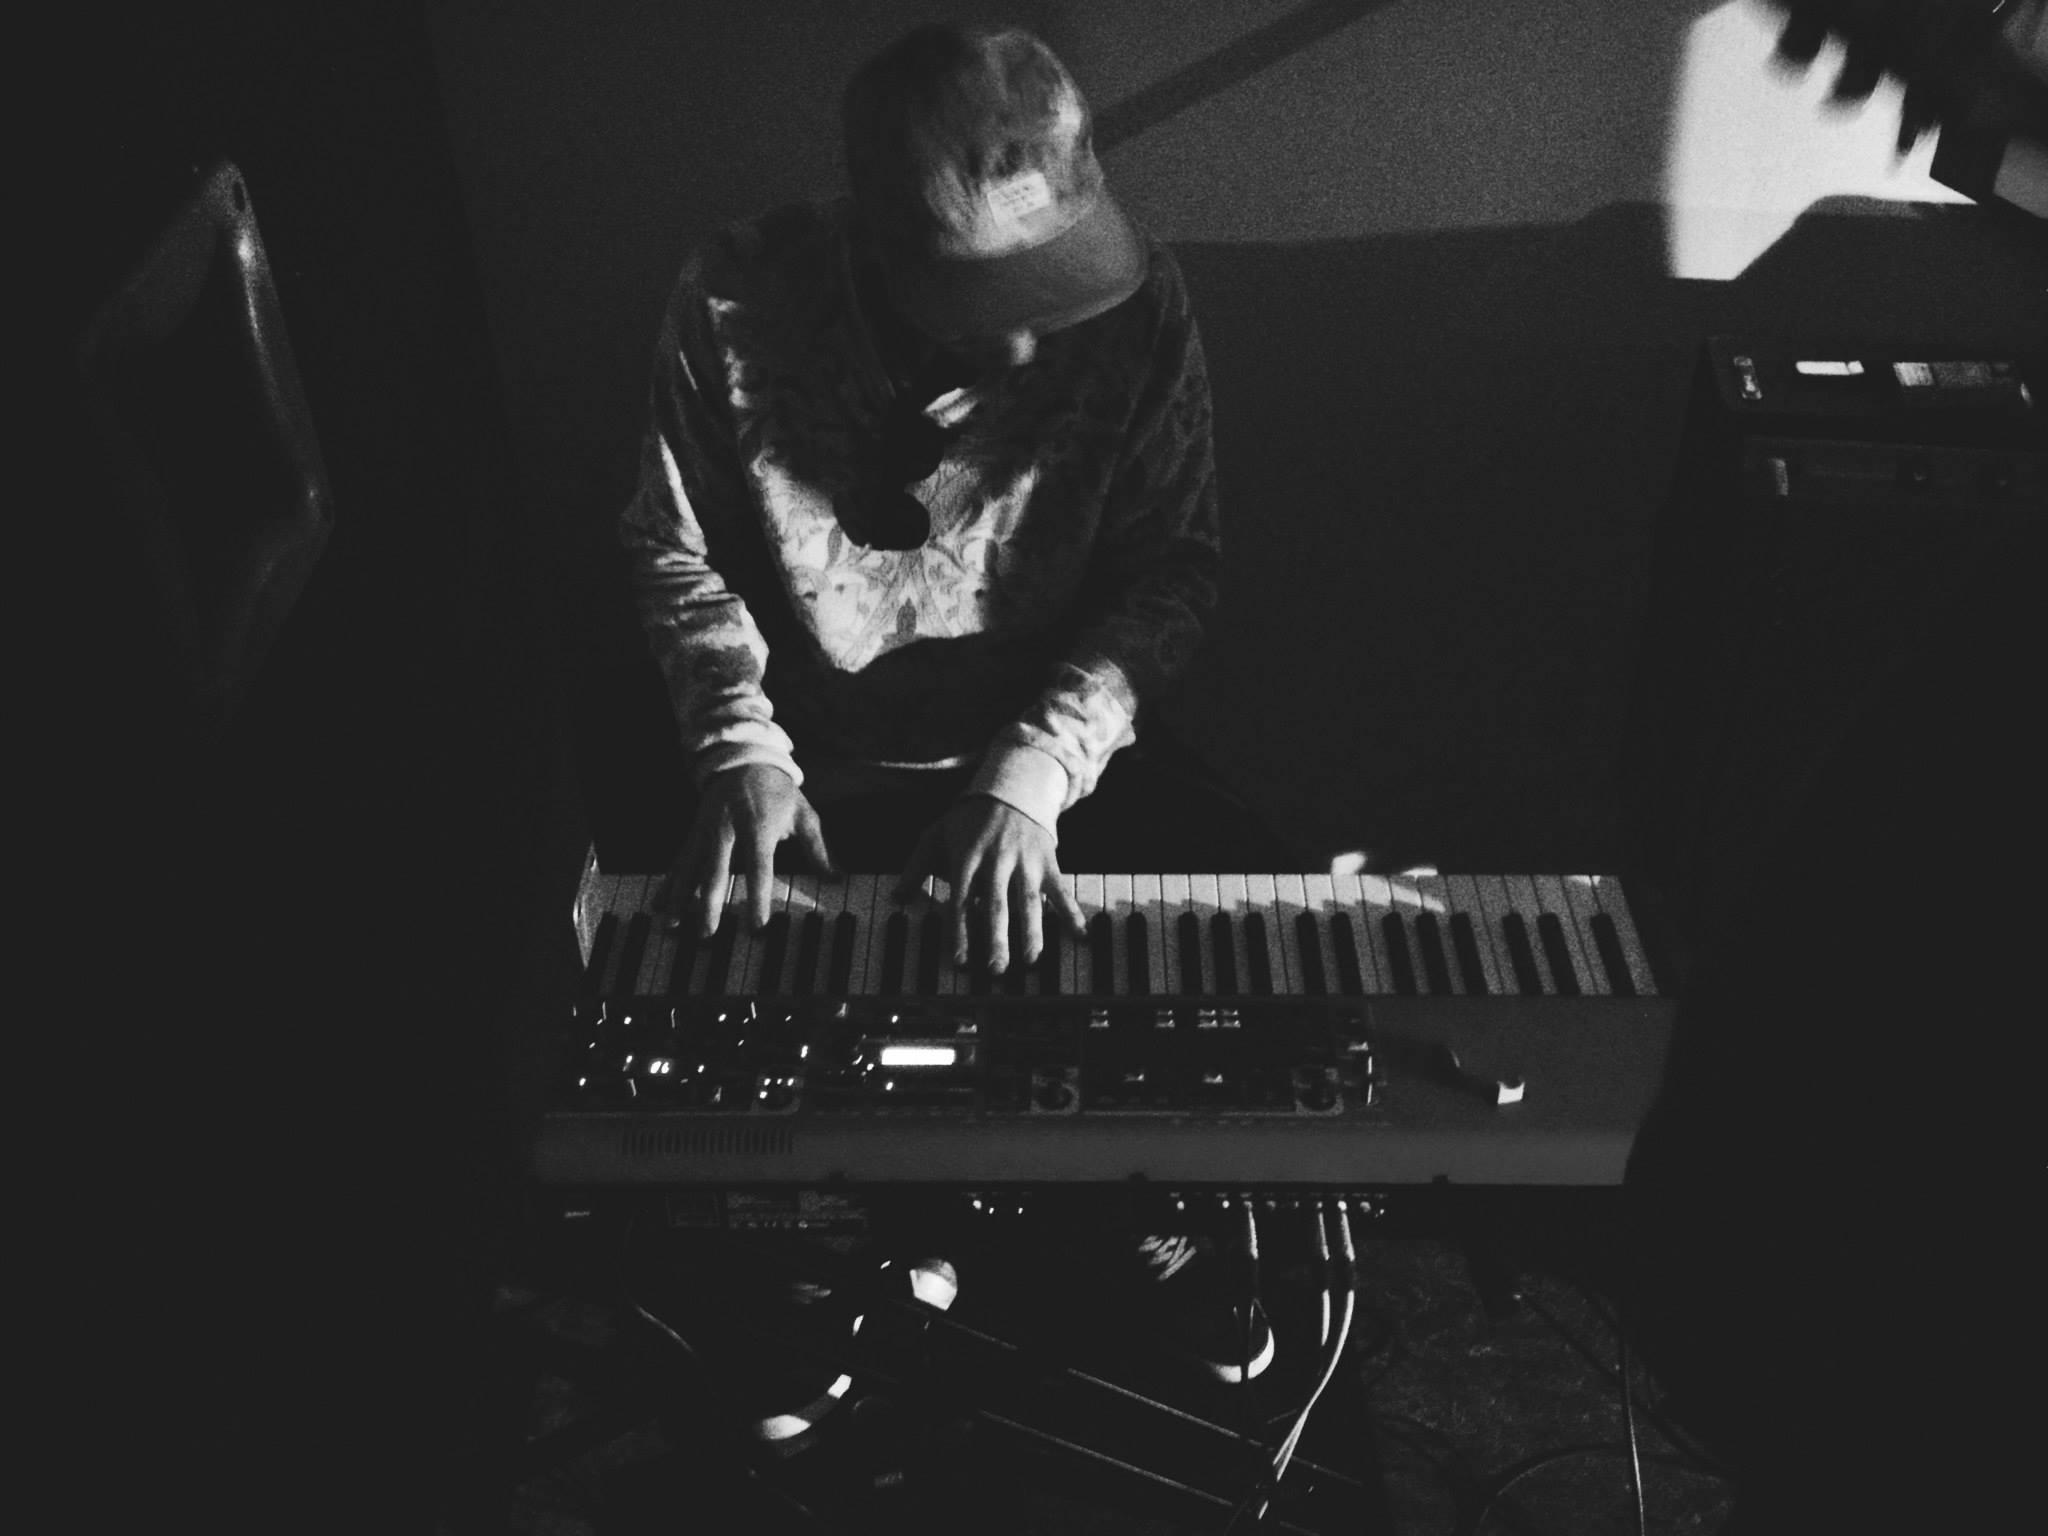 Albert_Romanutti_Jam_Session